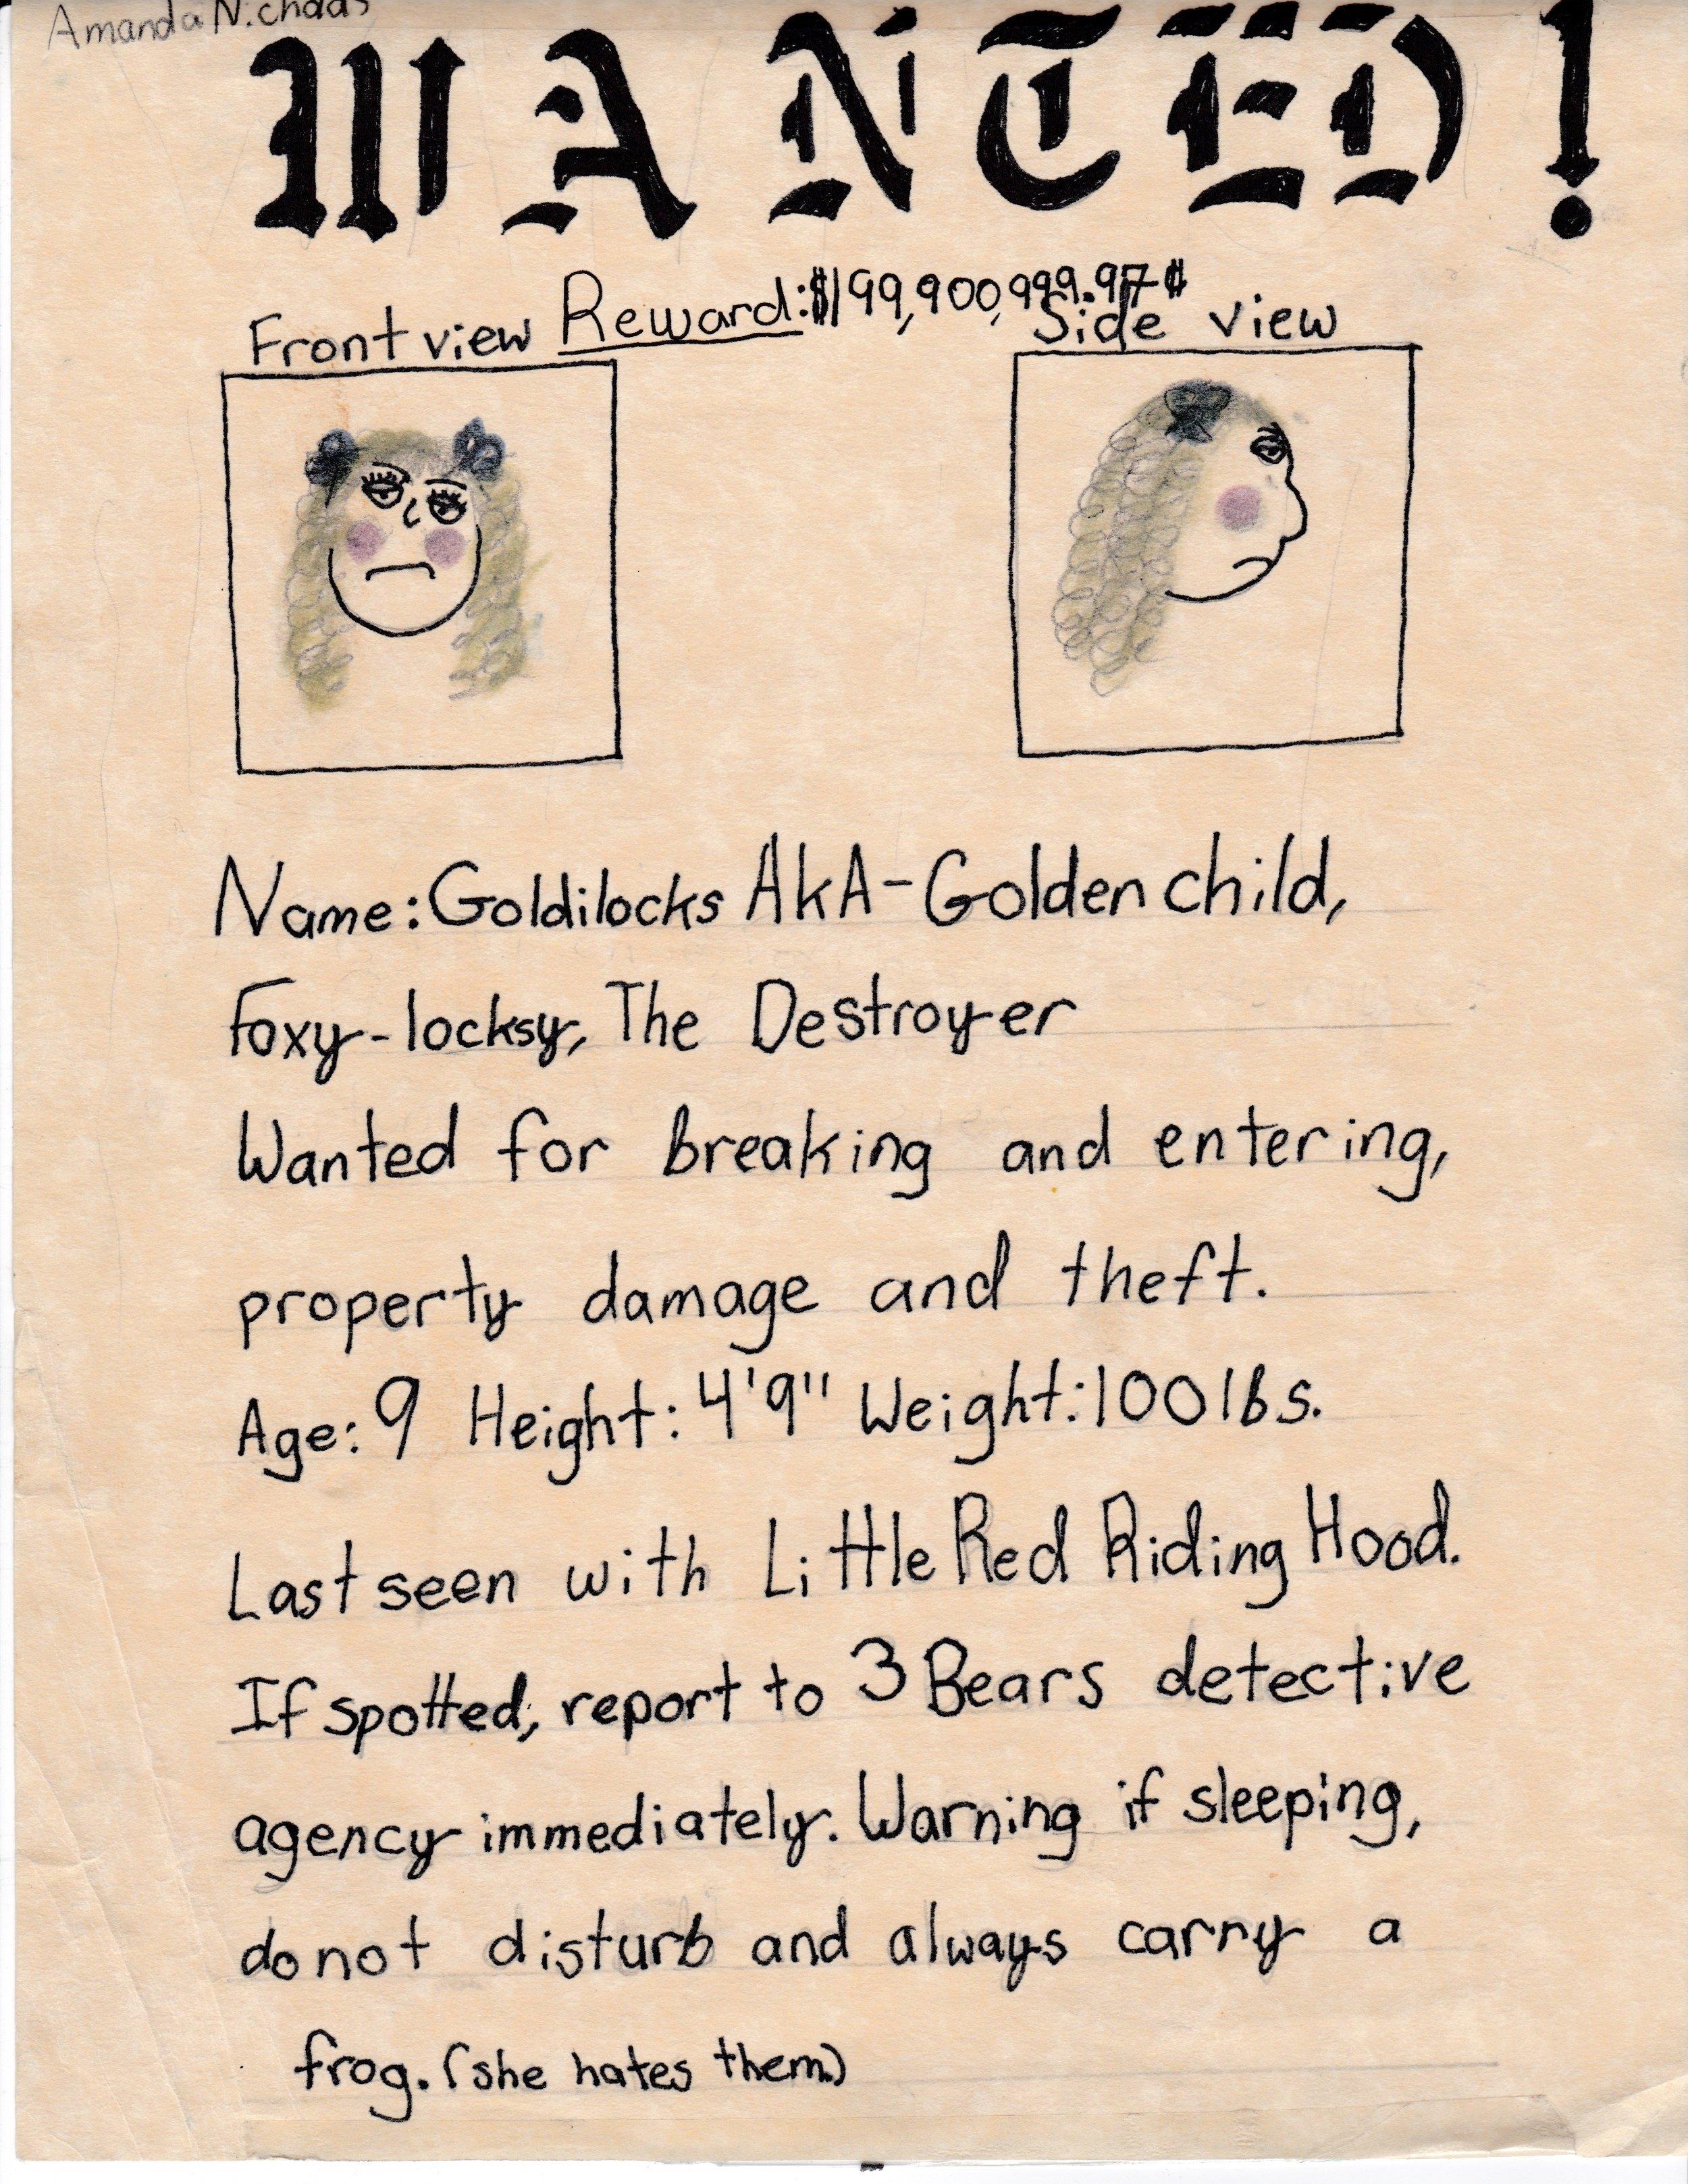 By Amanda Nichols, 4th grade, circa 2000.